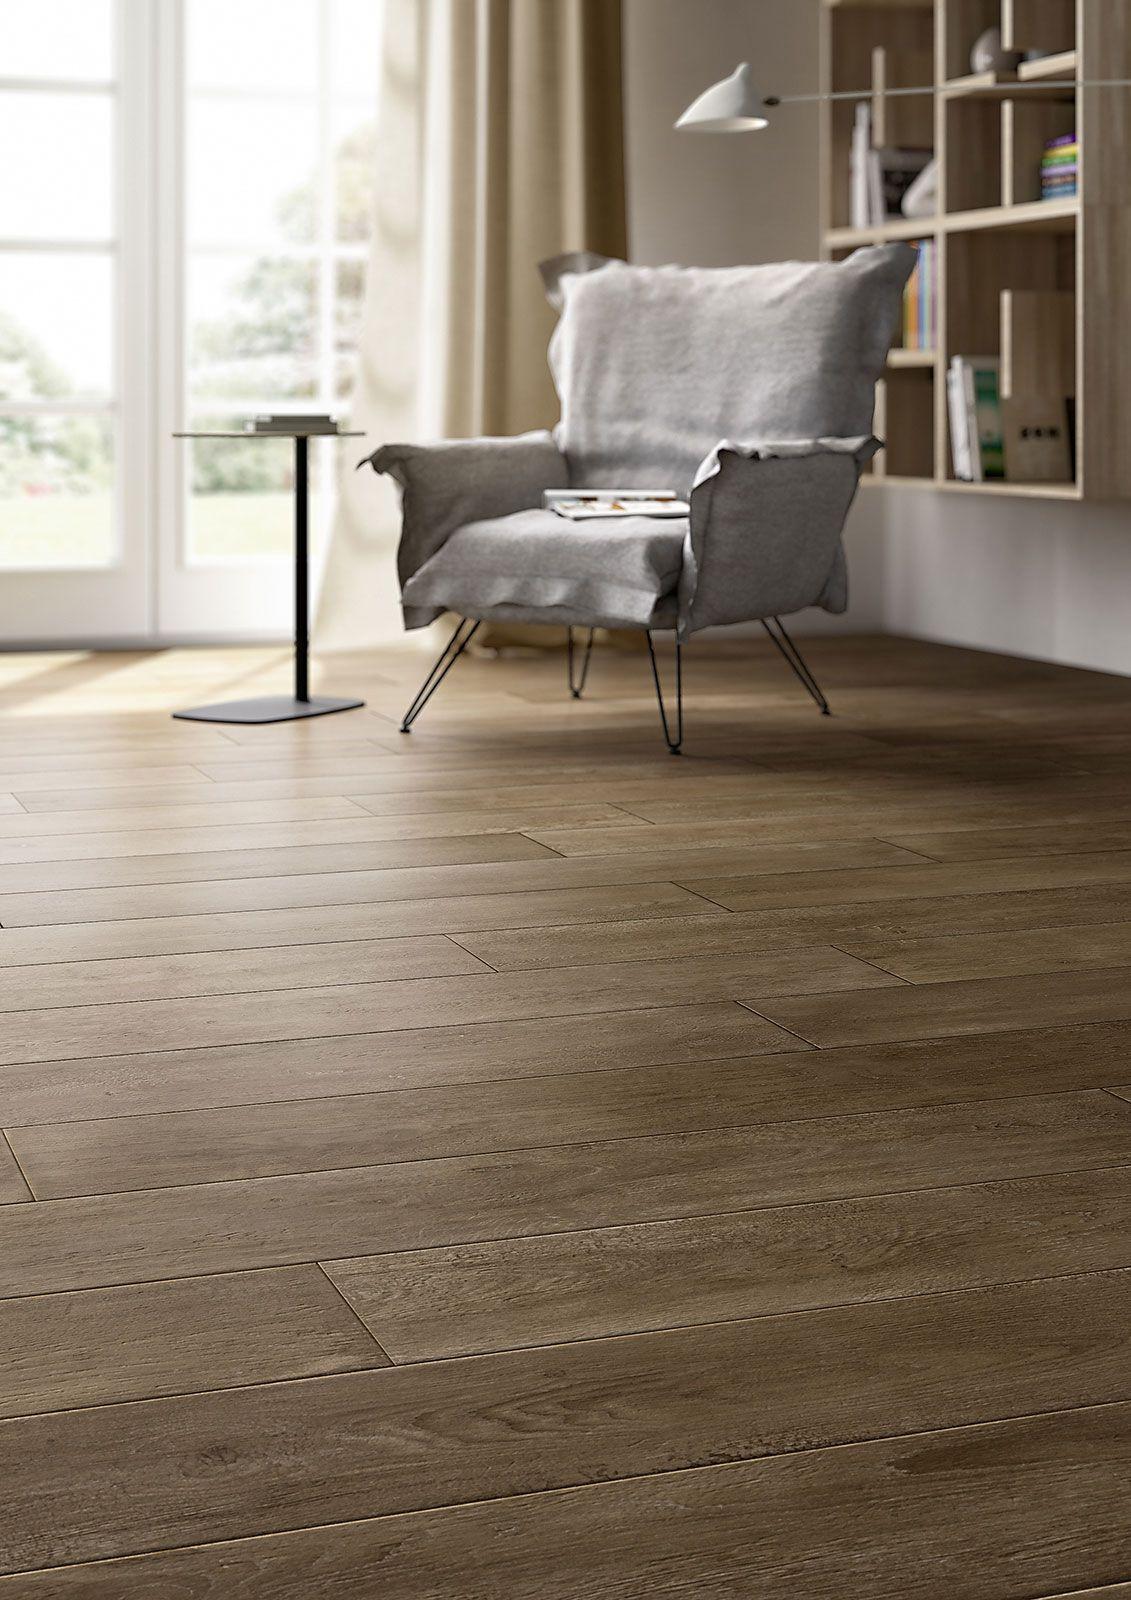 Treverktime gres imitaci n madera para pavimento for Suelo gres imitacion madera